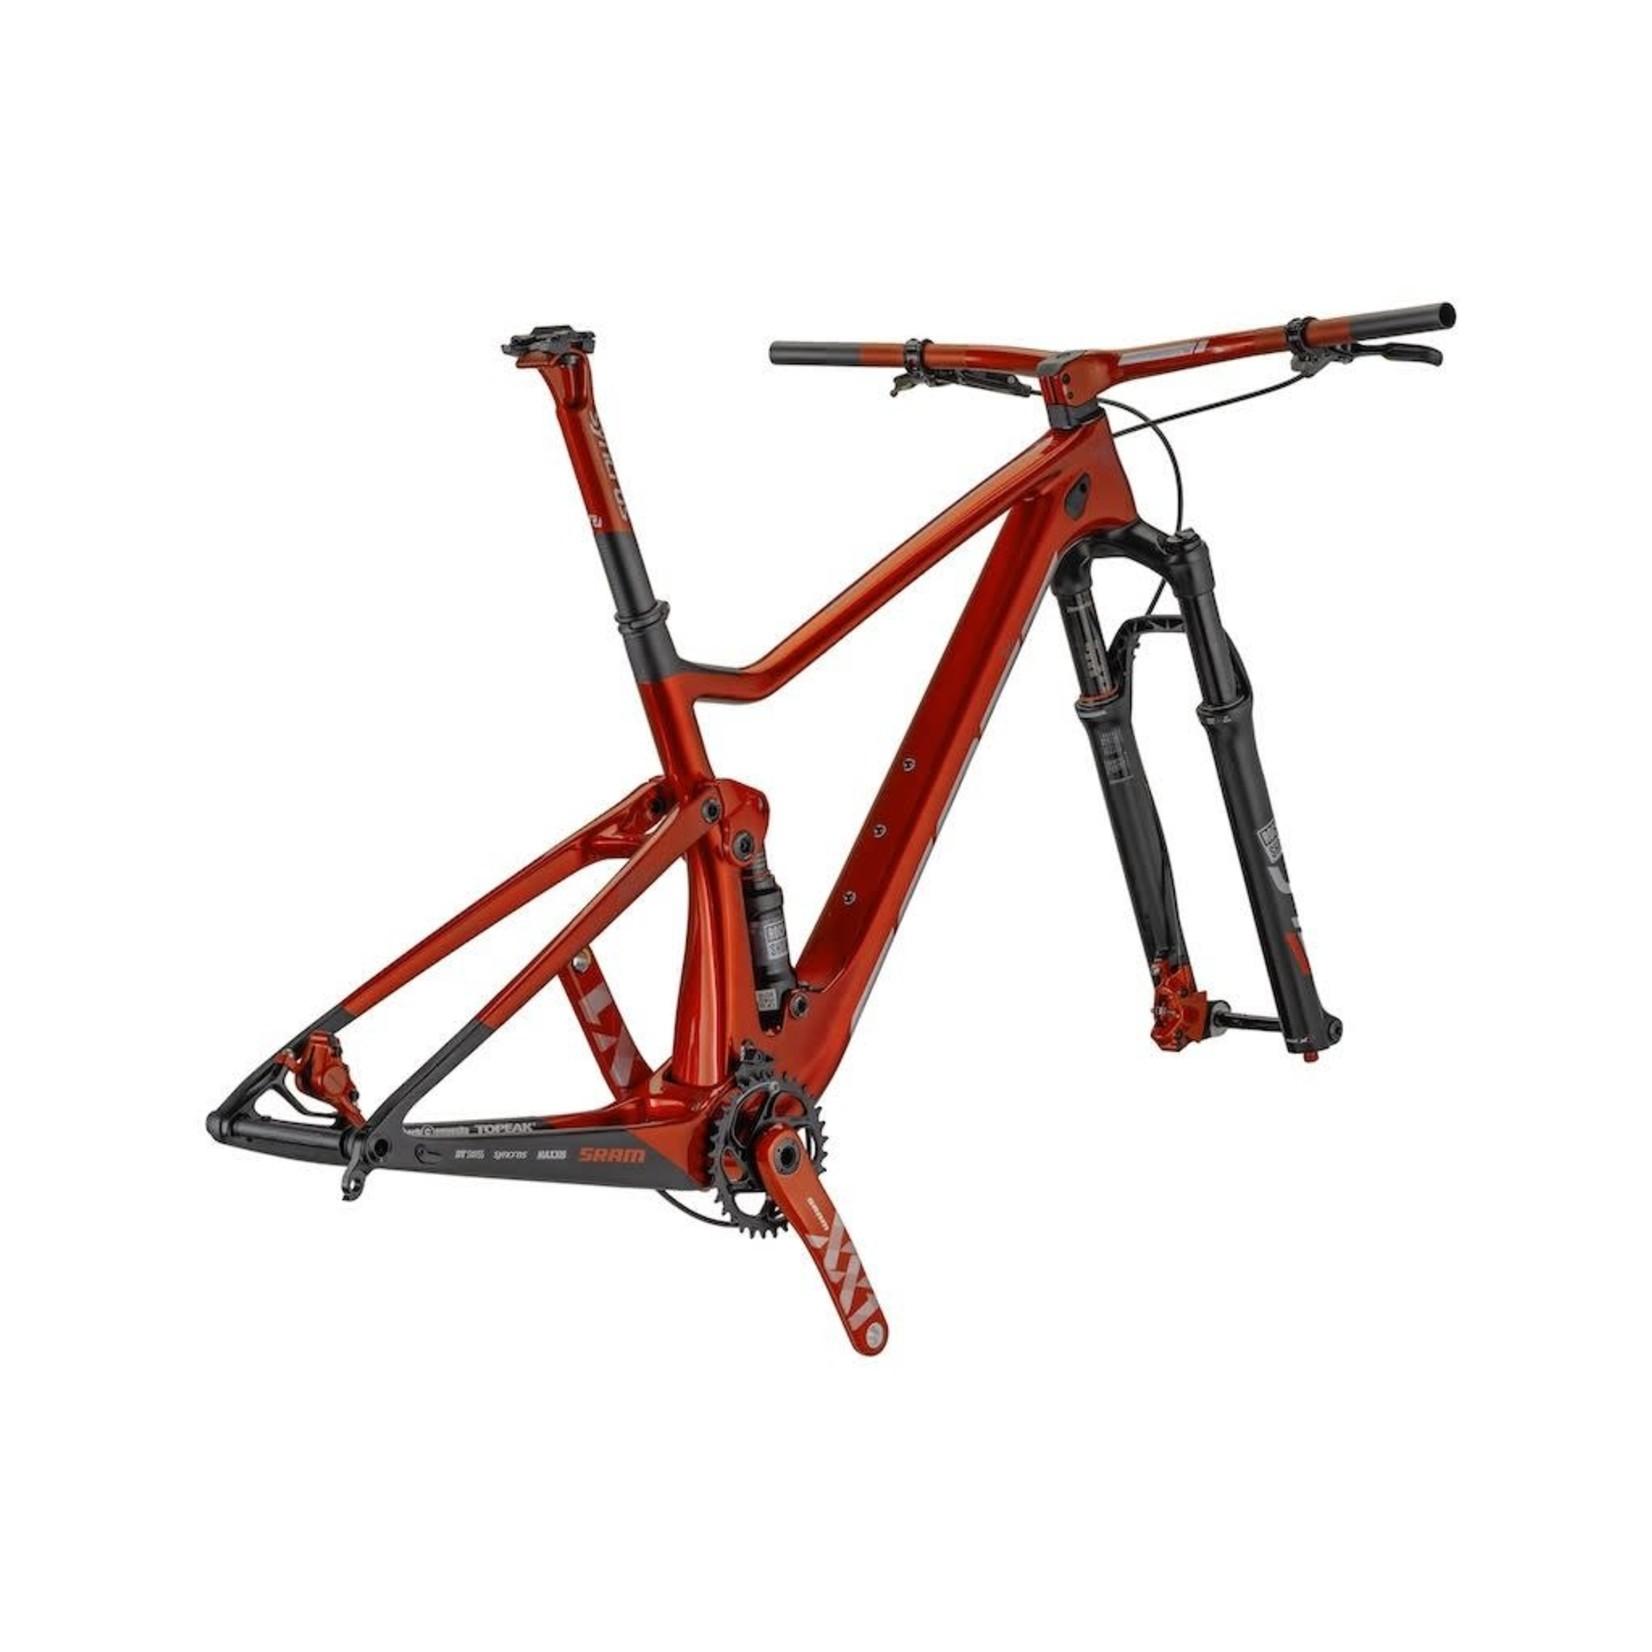 SCOTT BICYCLES Frame Set Scott With Kit Spark RC 900 WC N1NO LTD HMX